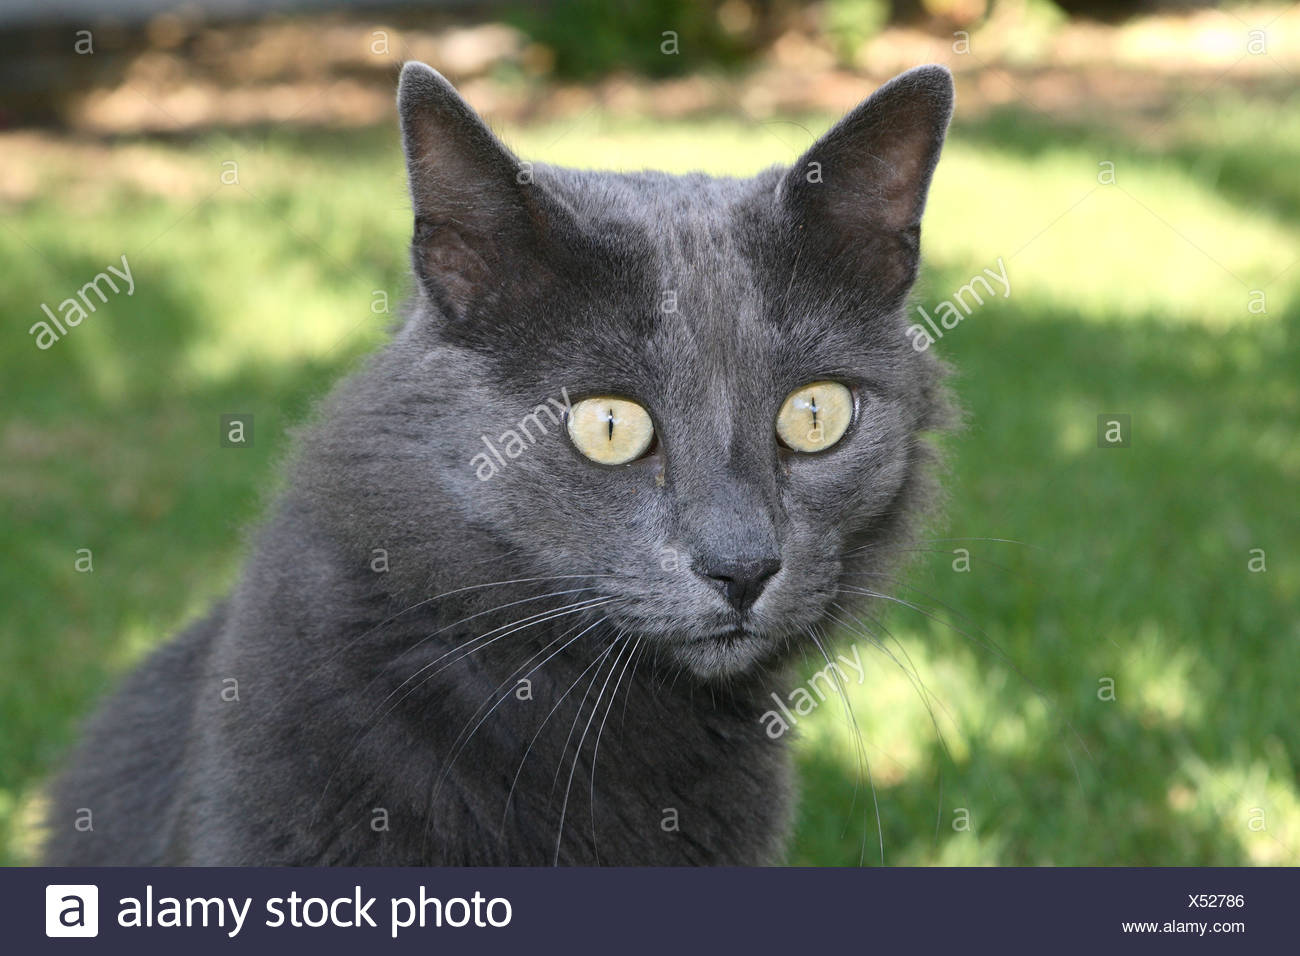 Cat gray garden sitting sees looks observes portrait animal